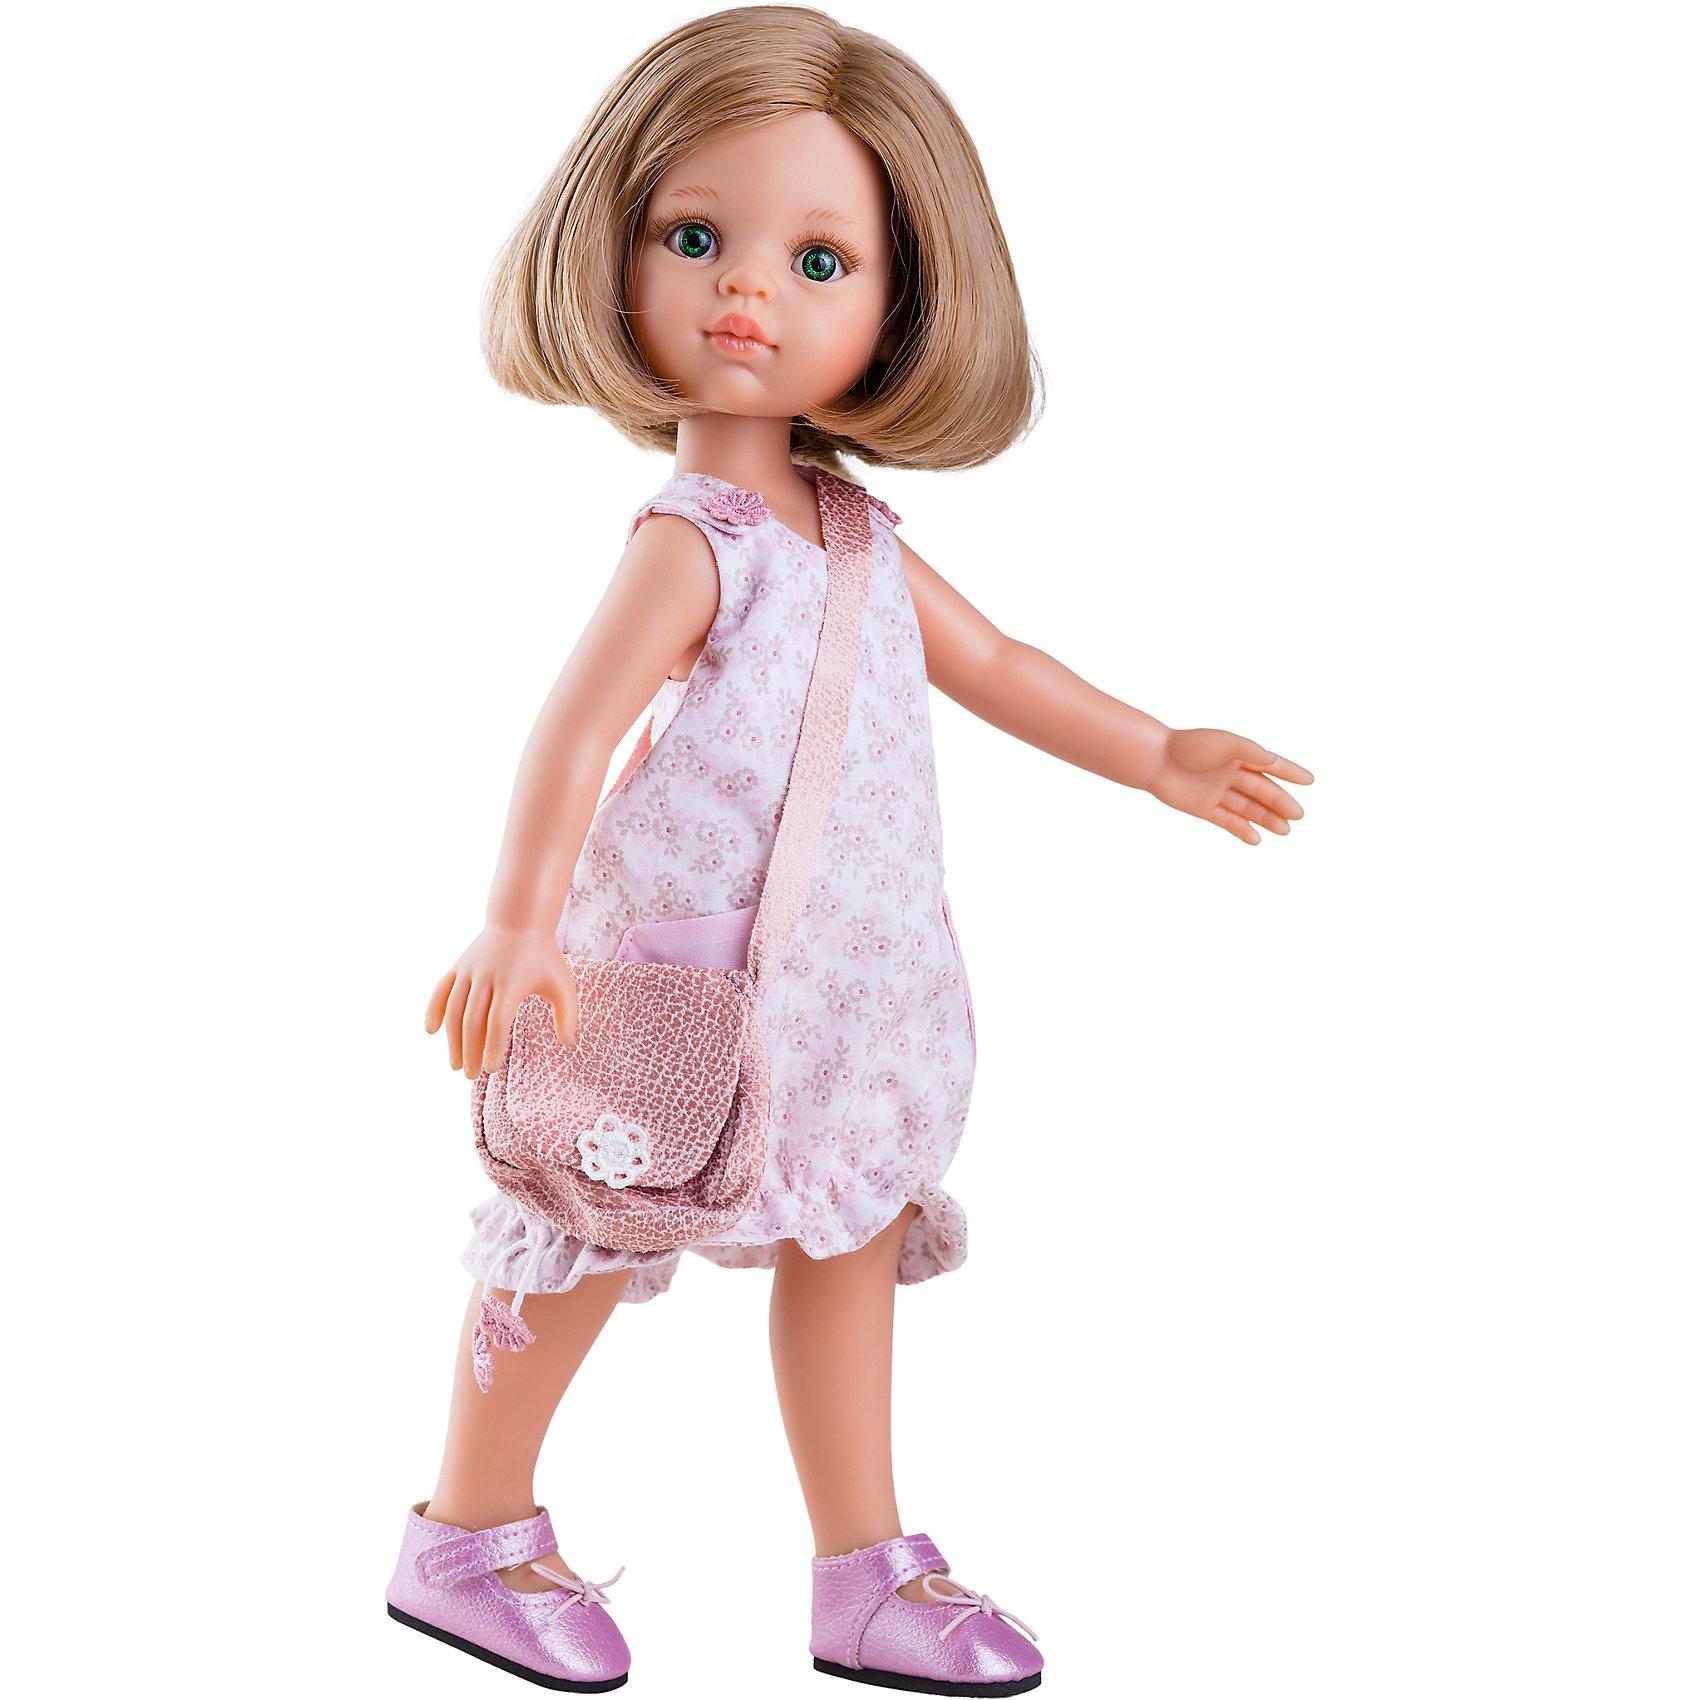 Кукла Карла, 32 см, Paola ReinaКлассические куклы<br><br><br>Ширина мм: 375<br>Глубина мм: 175<br>Высота мм: 105<br>Вес г: 625<br>Возраст от месяцев: 36<br>Возраст до месяцев: 144<br>Пол: Женский<br>Возраст: Детский<br>SKU: 6671050